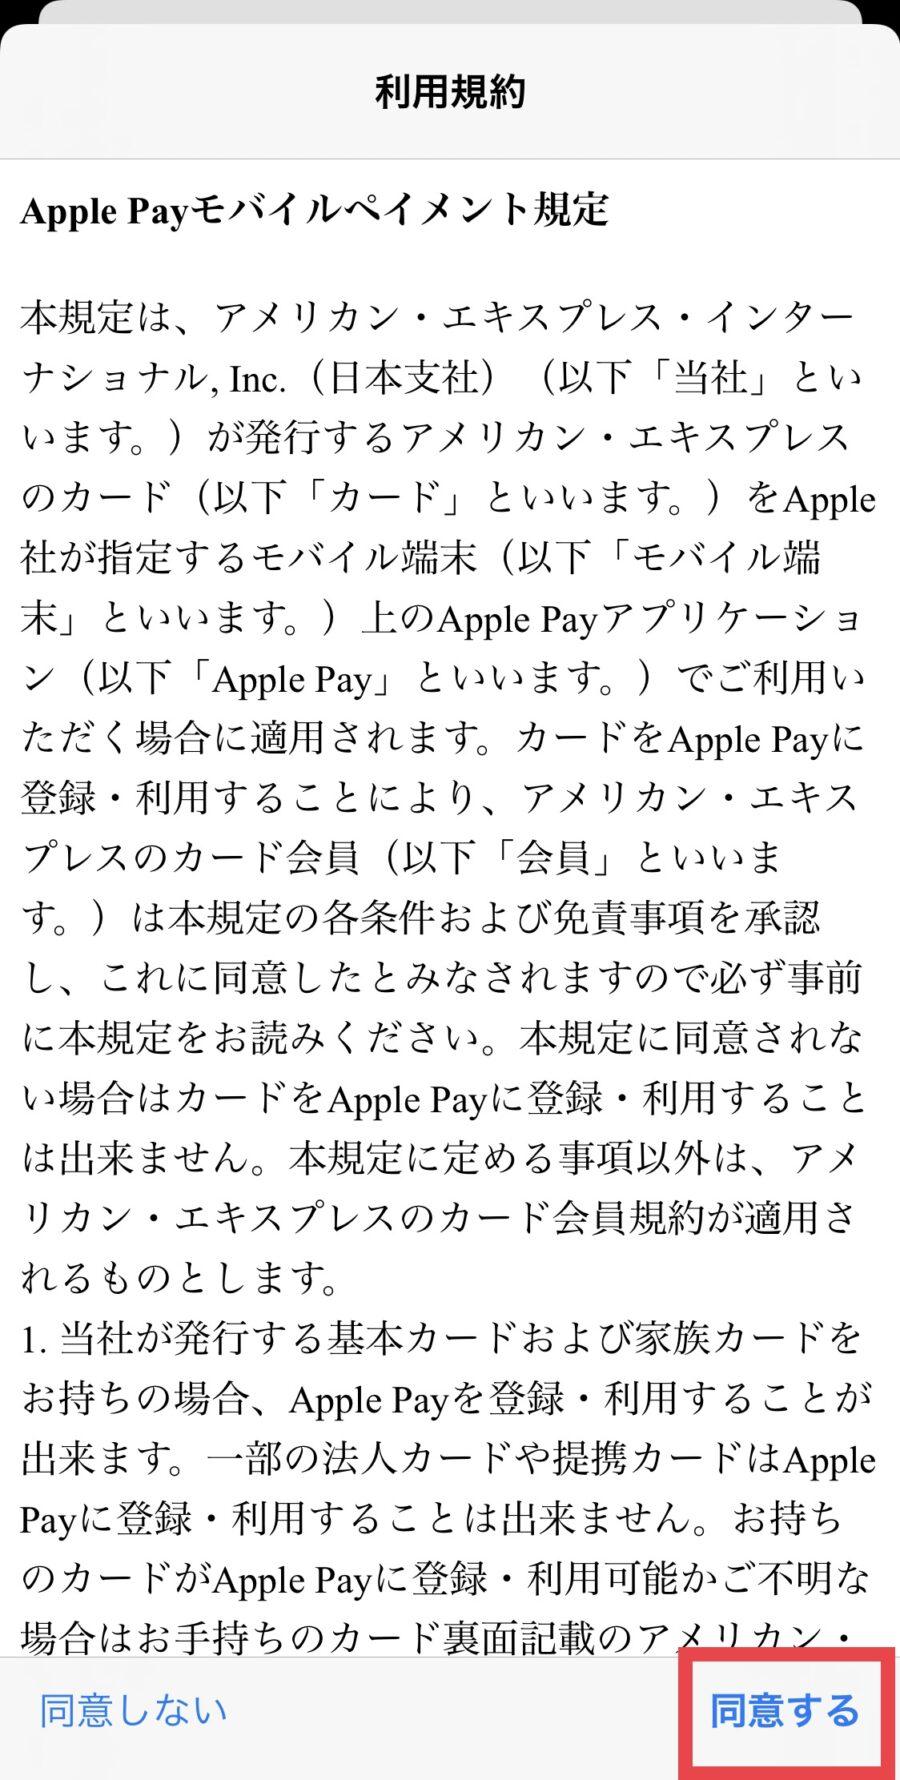 Apple Pay(Walletアプリ)のクレジットカード追加・変更方法5